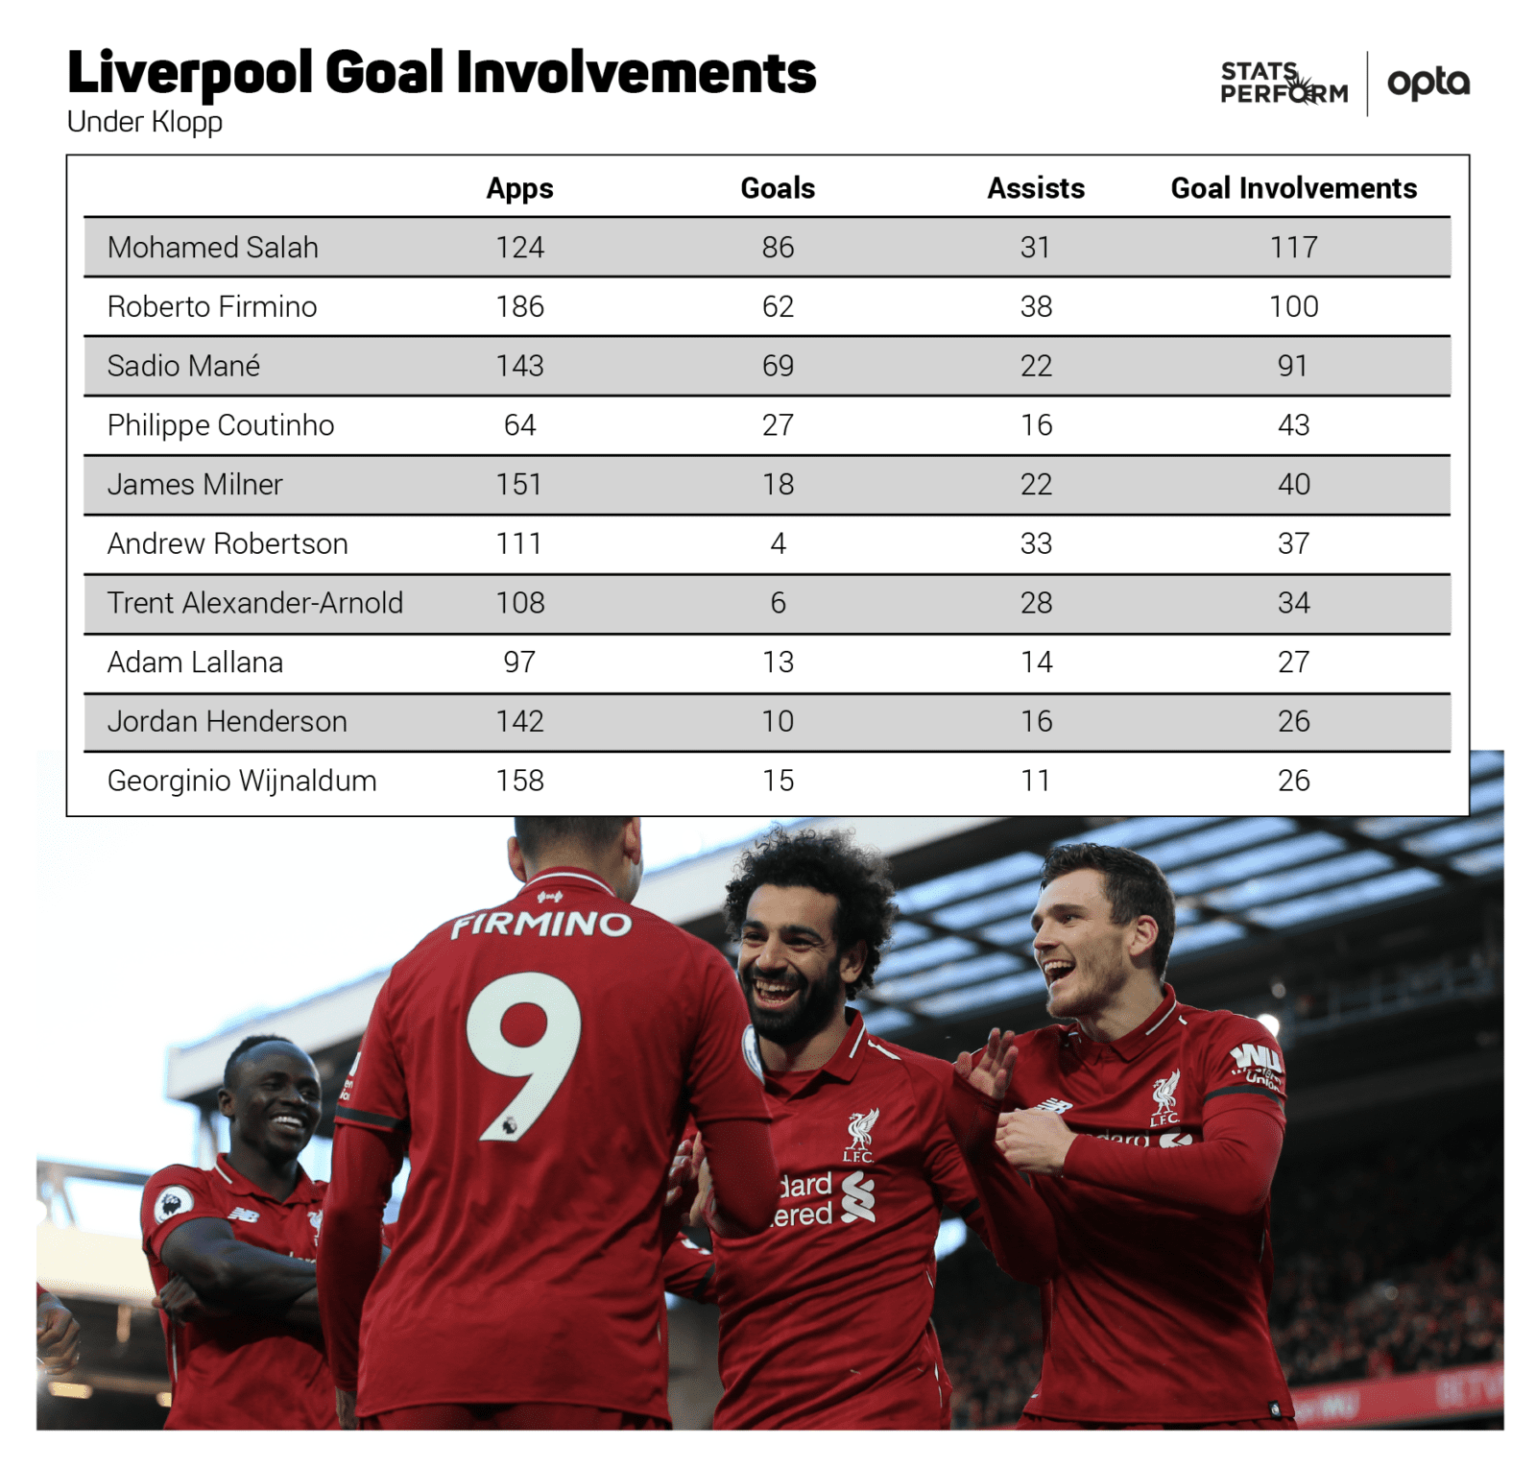 Liverpool goal involvements